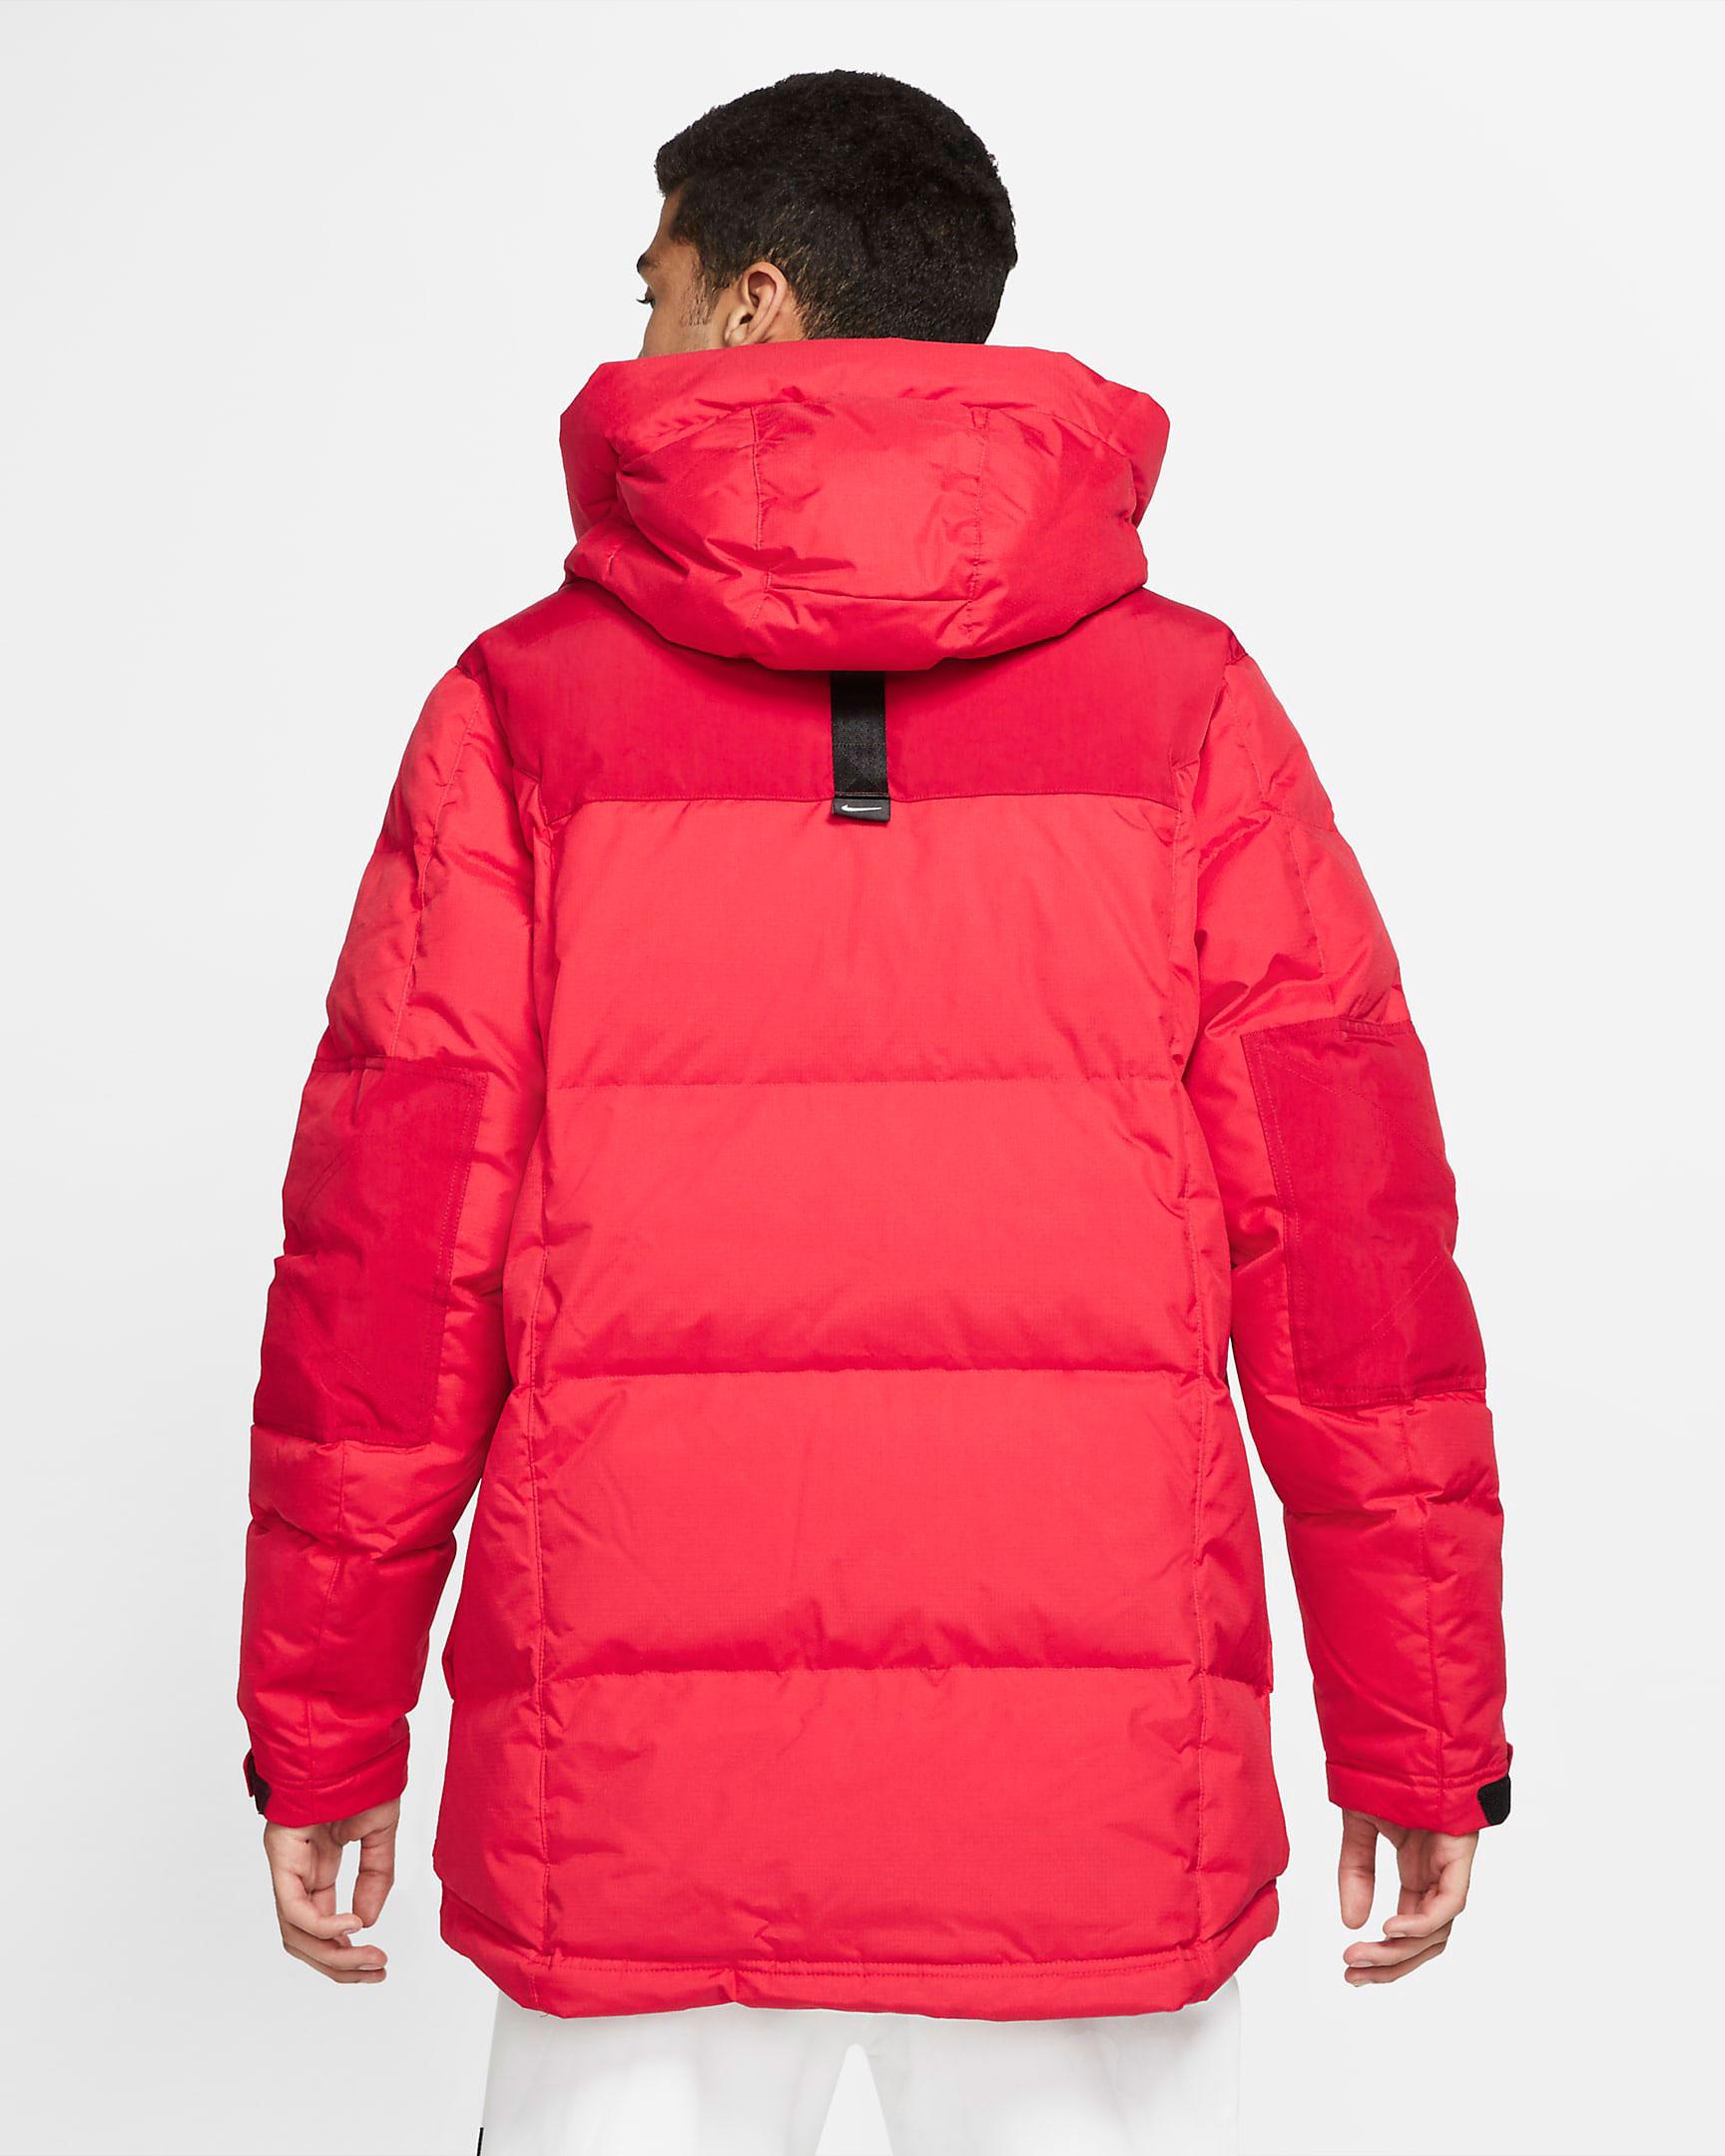 nike-air-max-90-nordic-christmas-winter-jacket-2